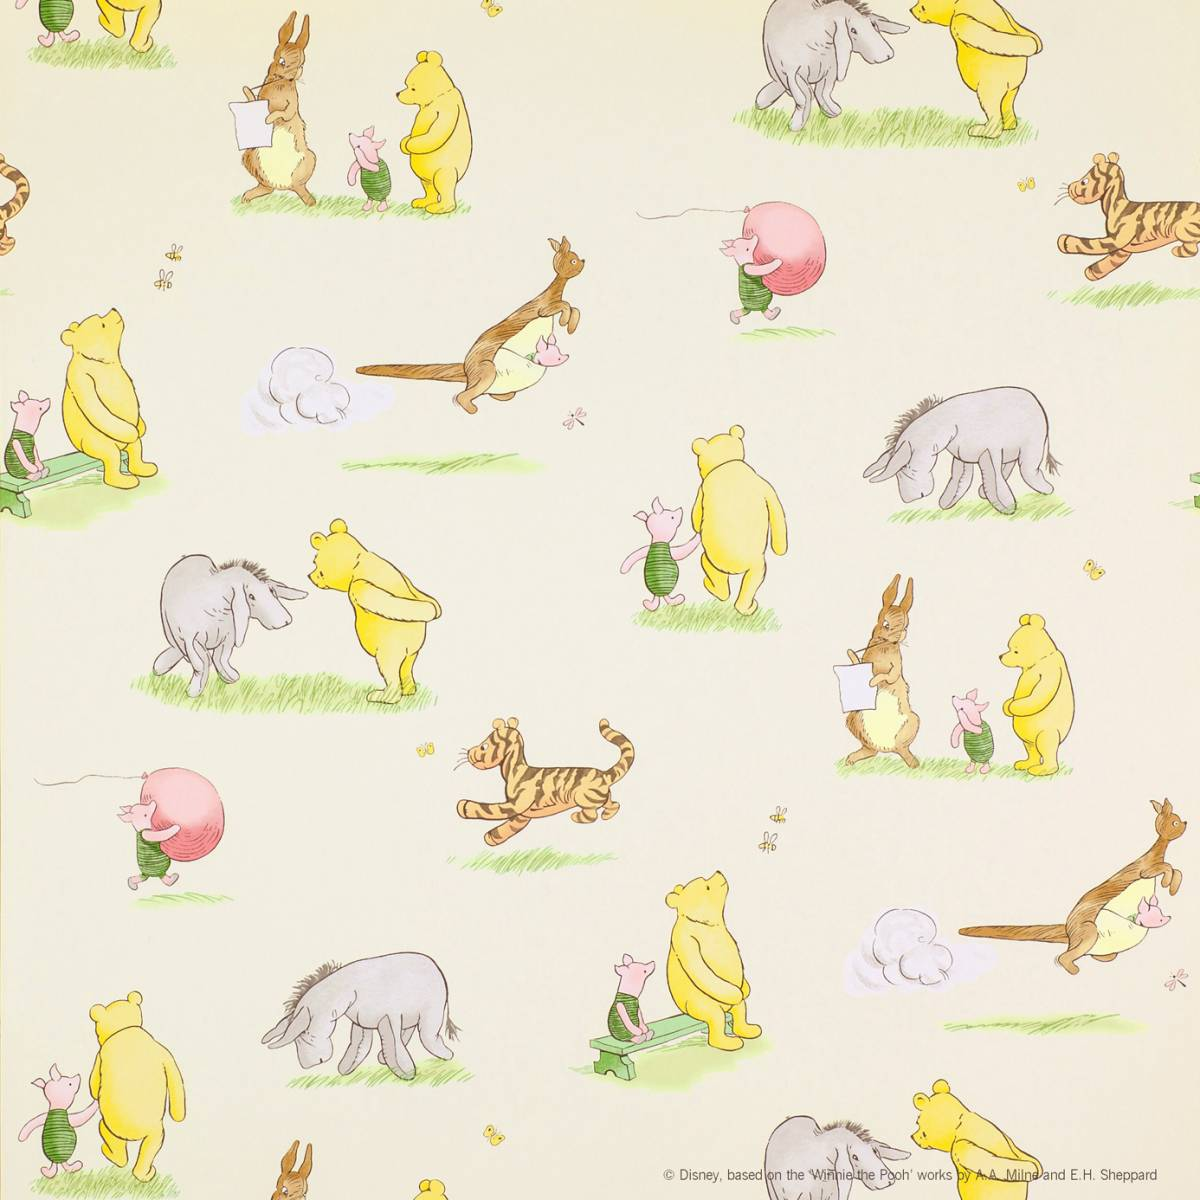 Winnie The Pooh And Friends Wallpaper Vintagemulti J127w 04